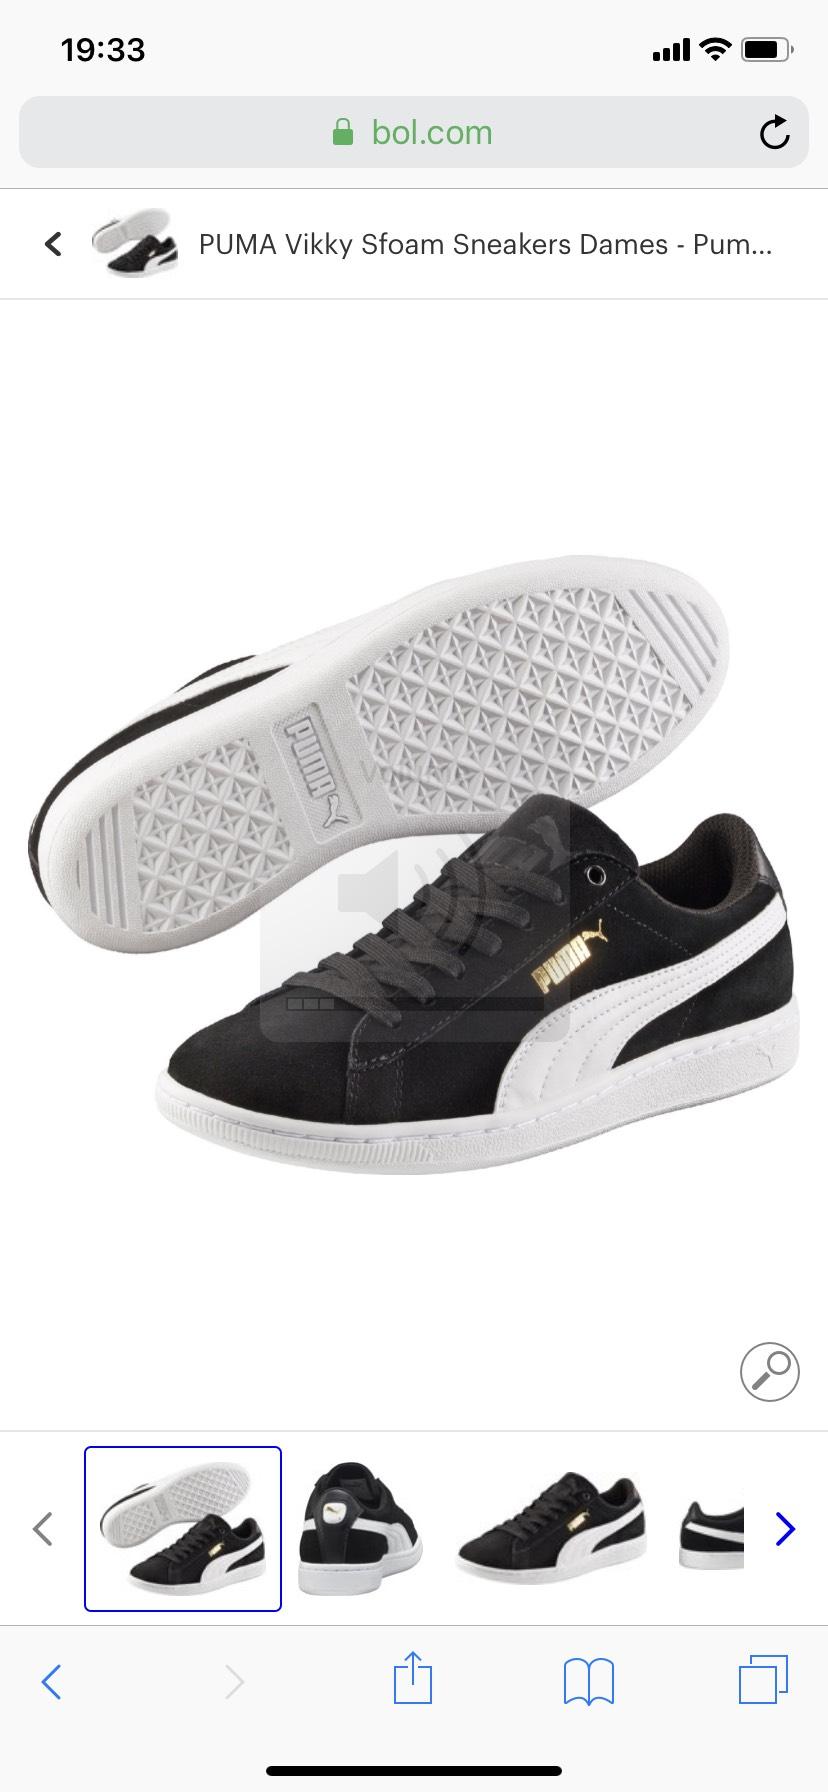 Korting op sneakers @ bol.com - oa Puma's